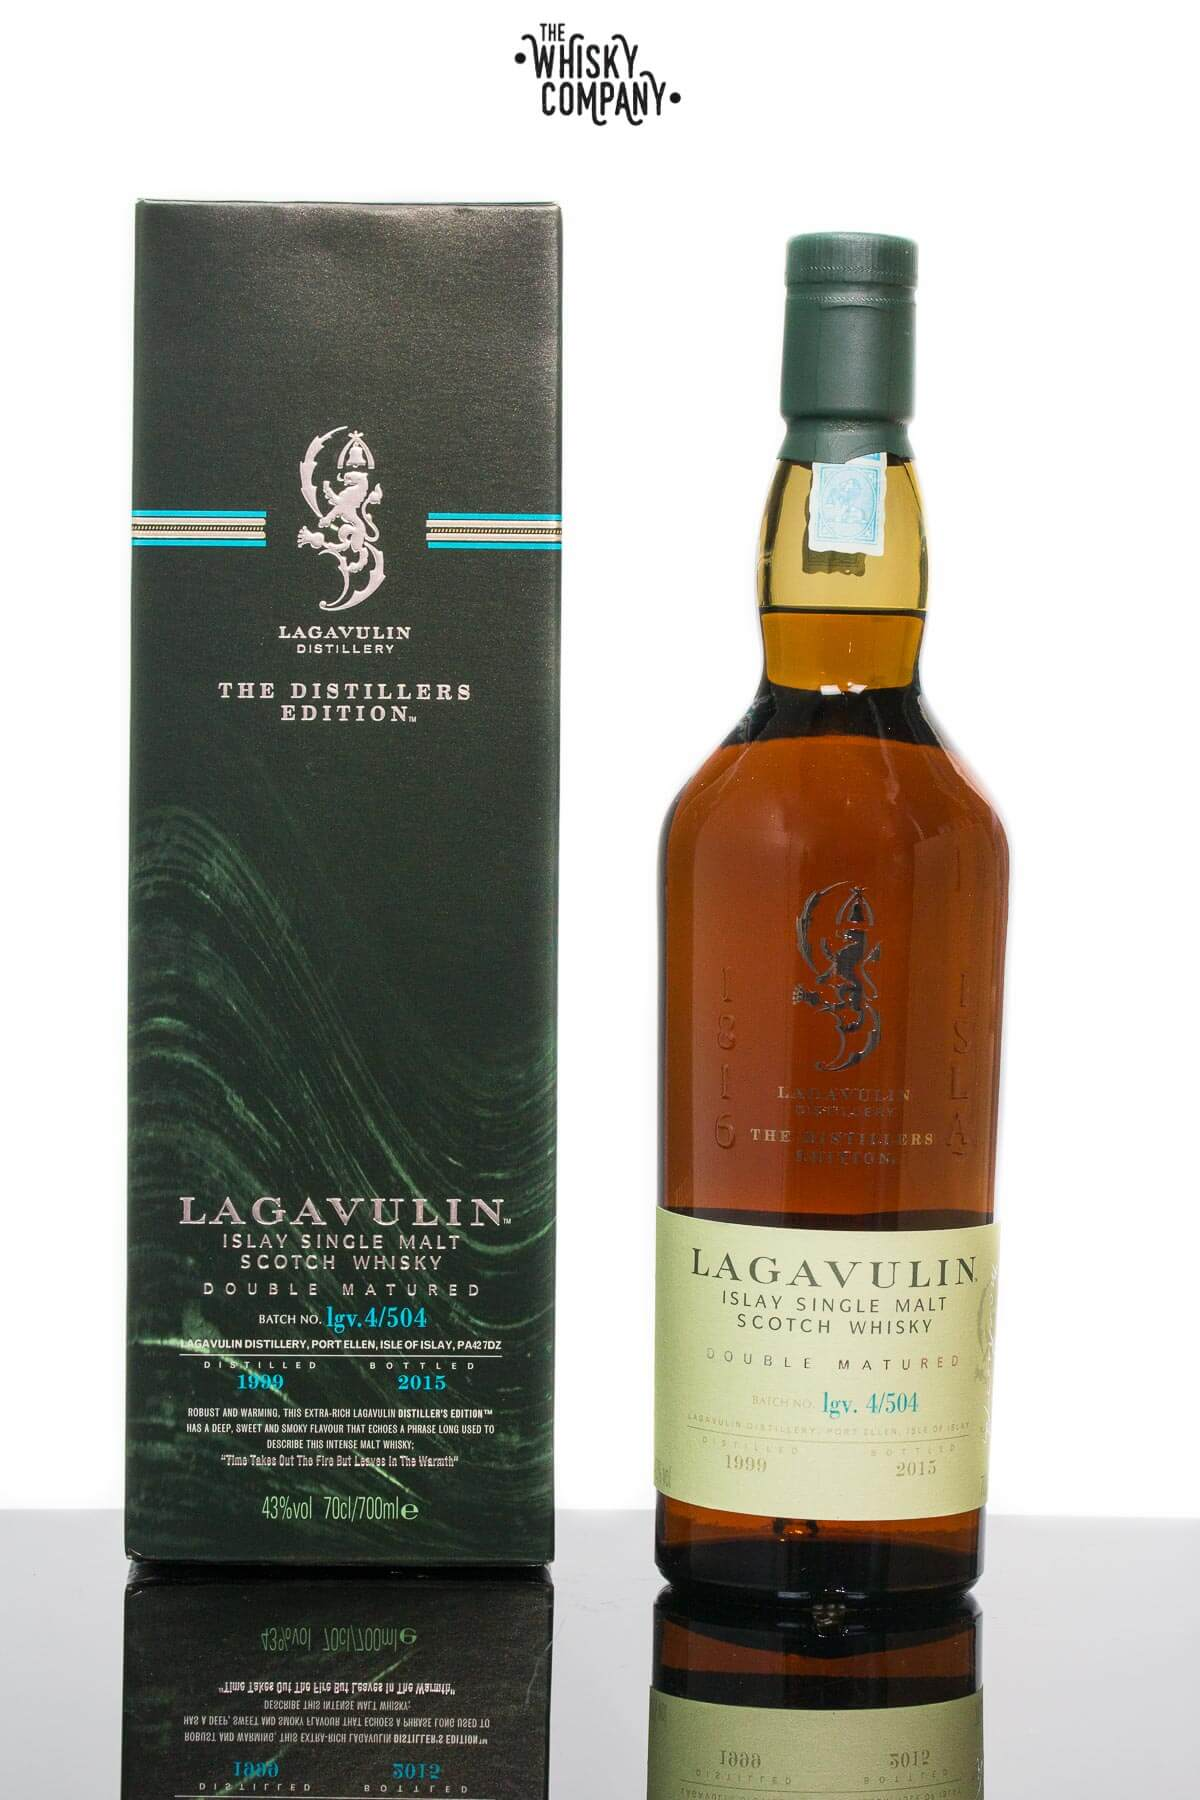 Lagavulin 1999 Distillers edition Islay Single Malt Scotch Whisky